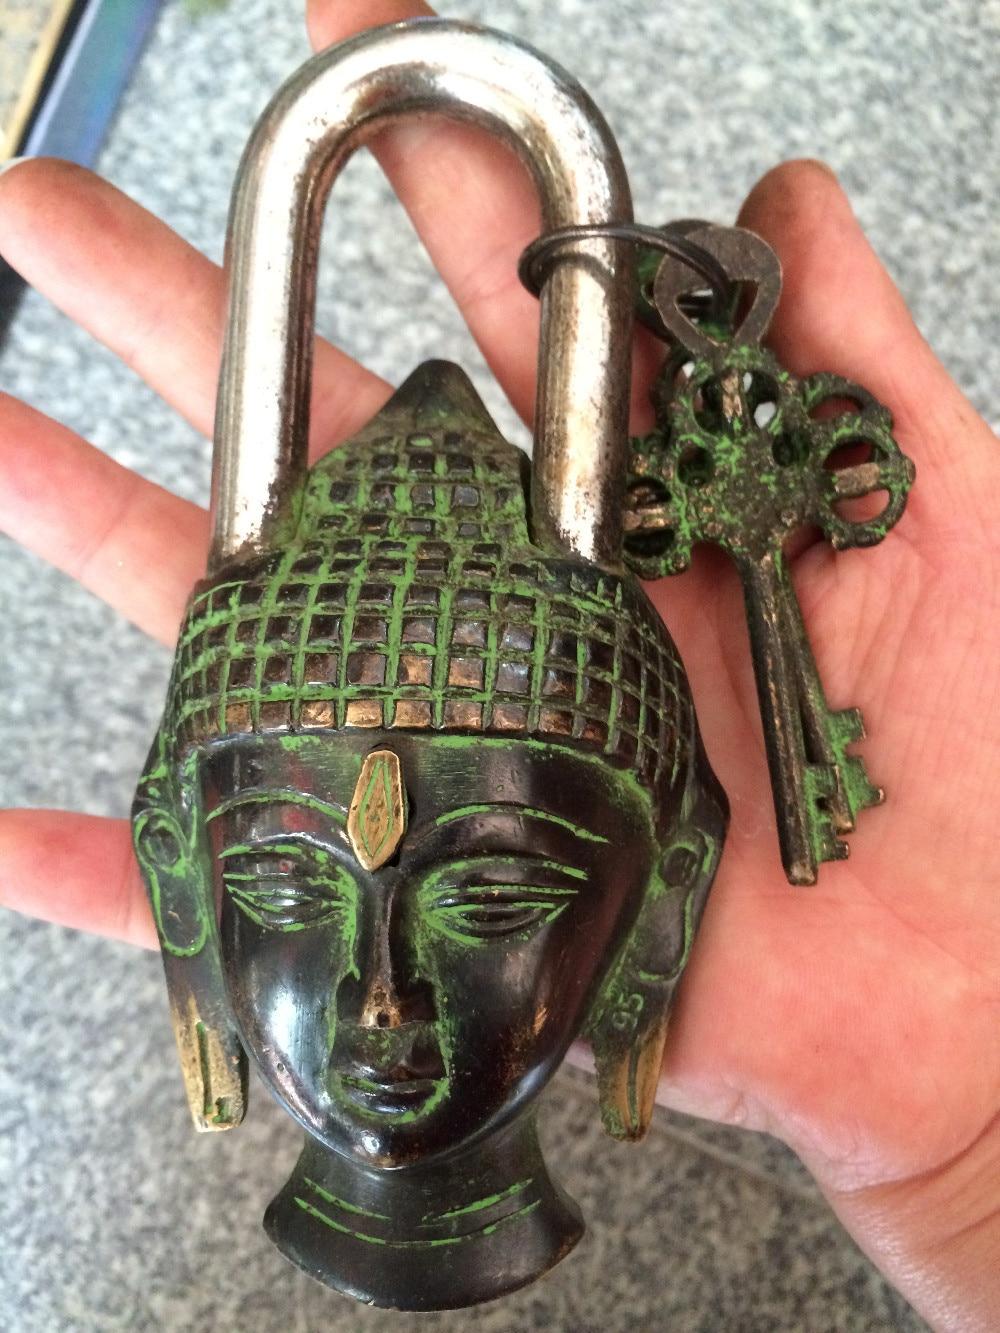 Raro chino antiguo estilo grande de latón tallado Buda cabeza estatua cerradura...